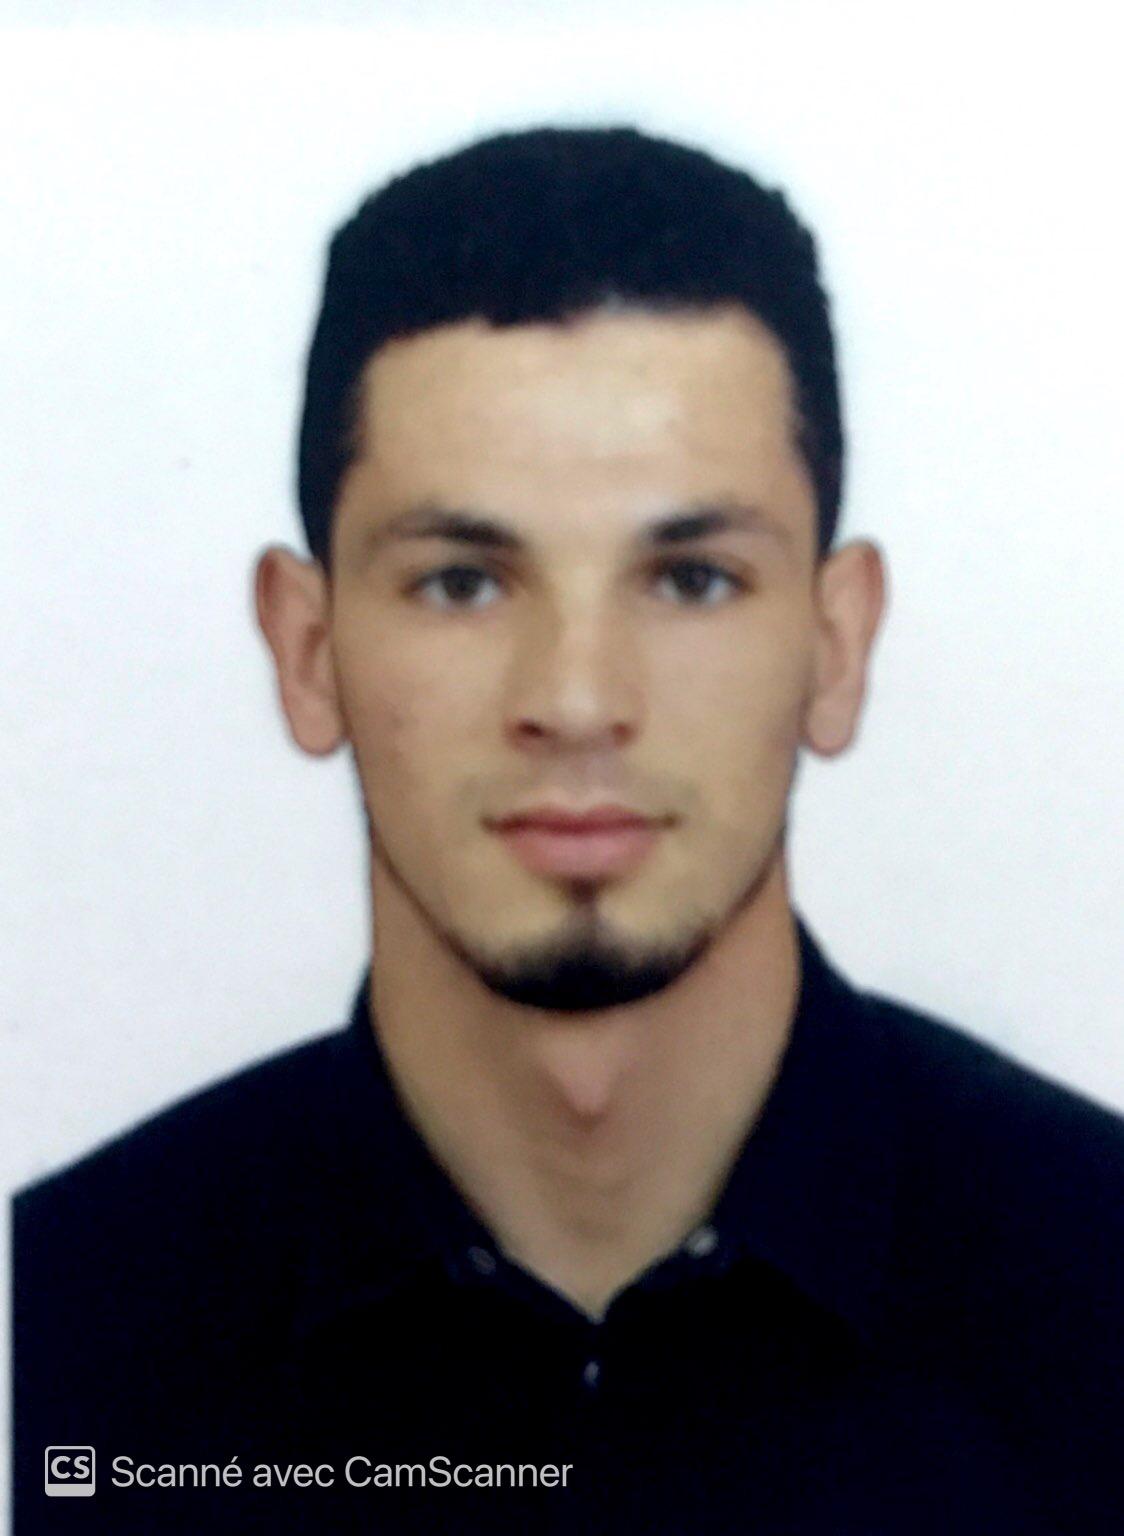 MECHARBAT Lotfi Abdelkrim